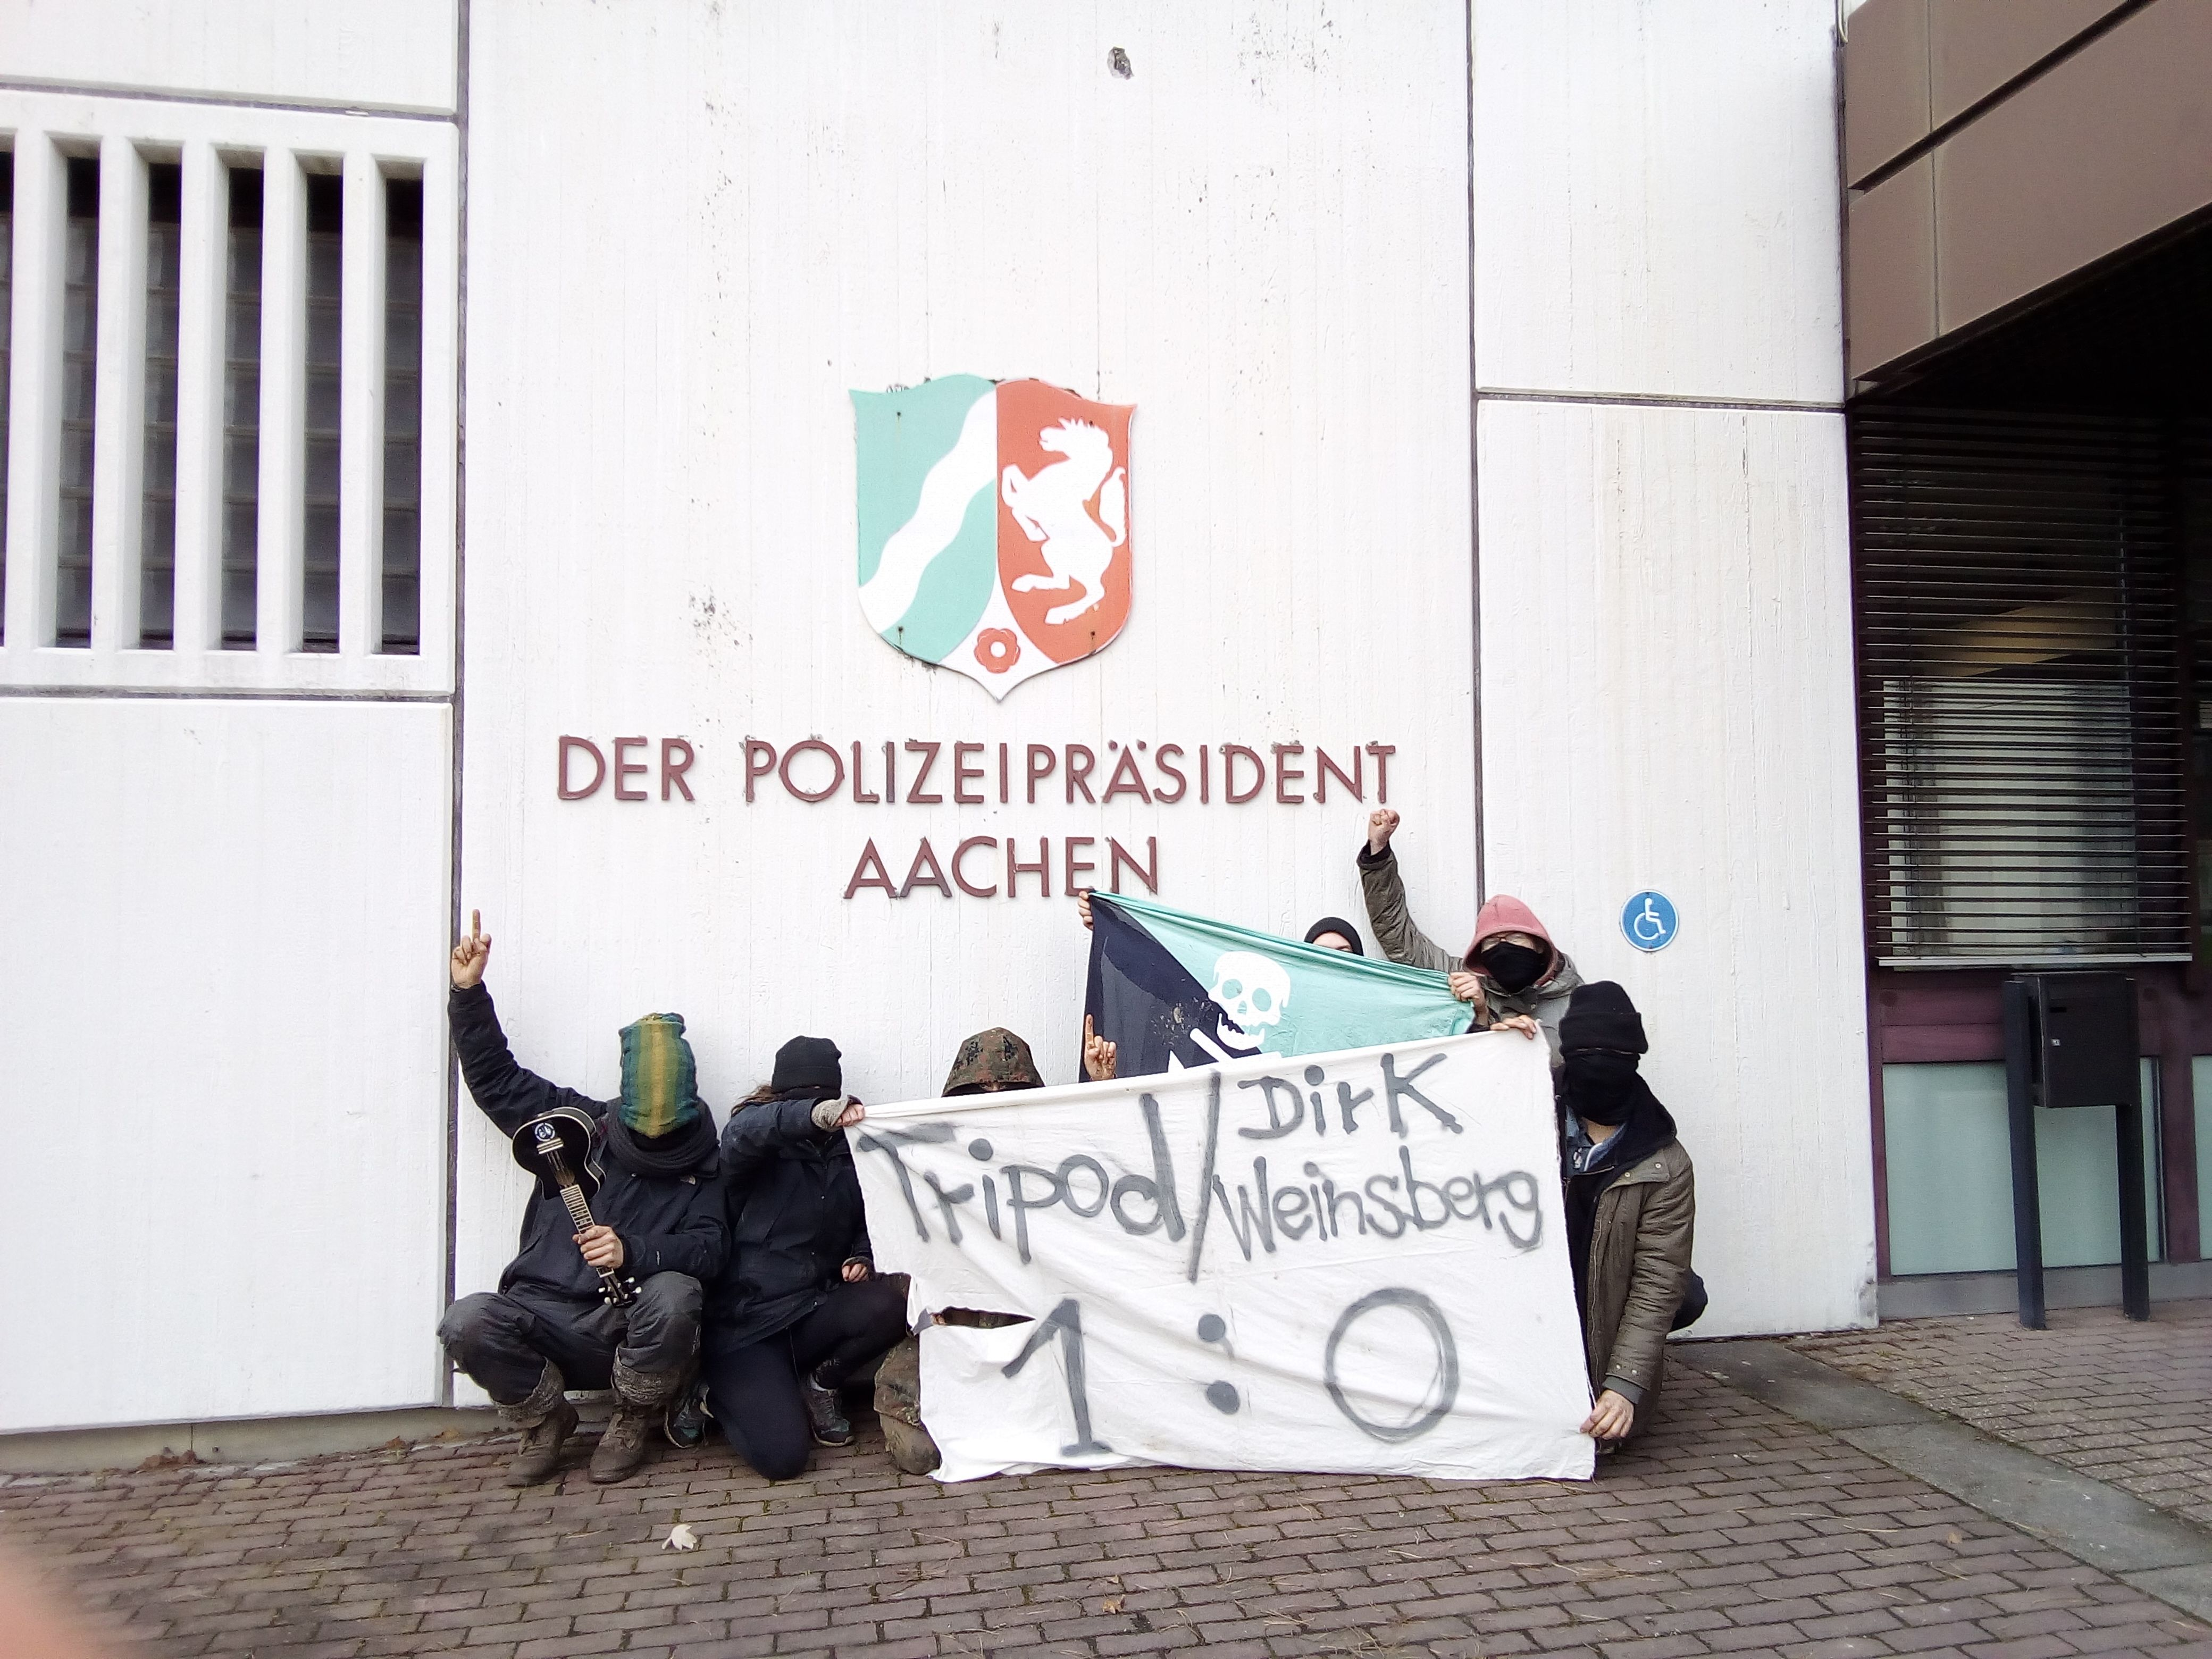 Tripod - Dirk Weinsberg 1: 0